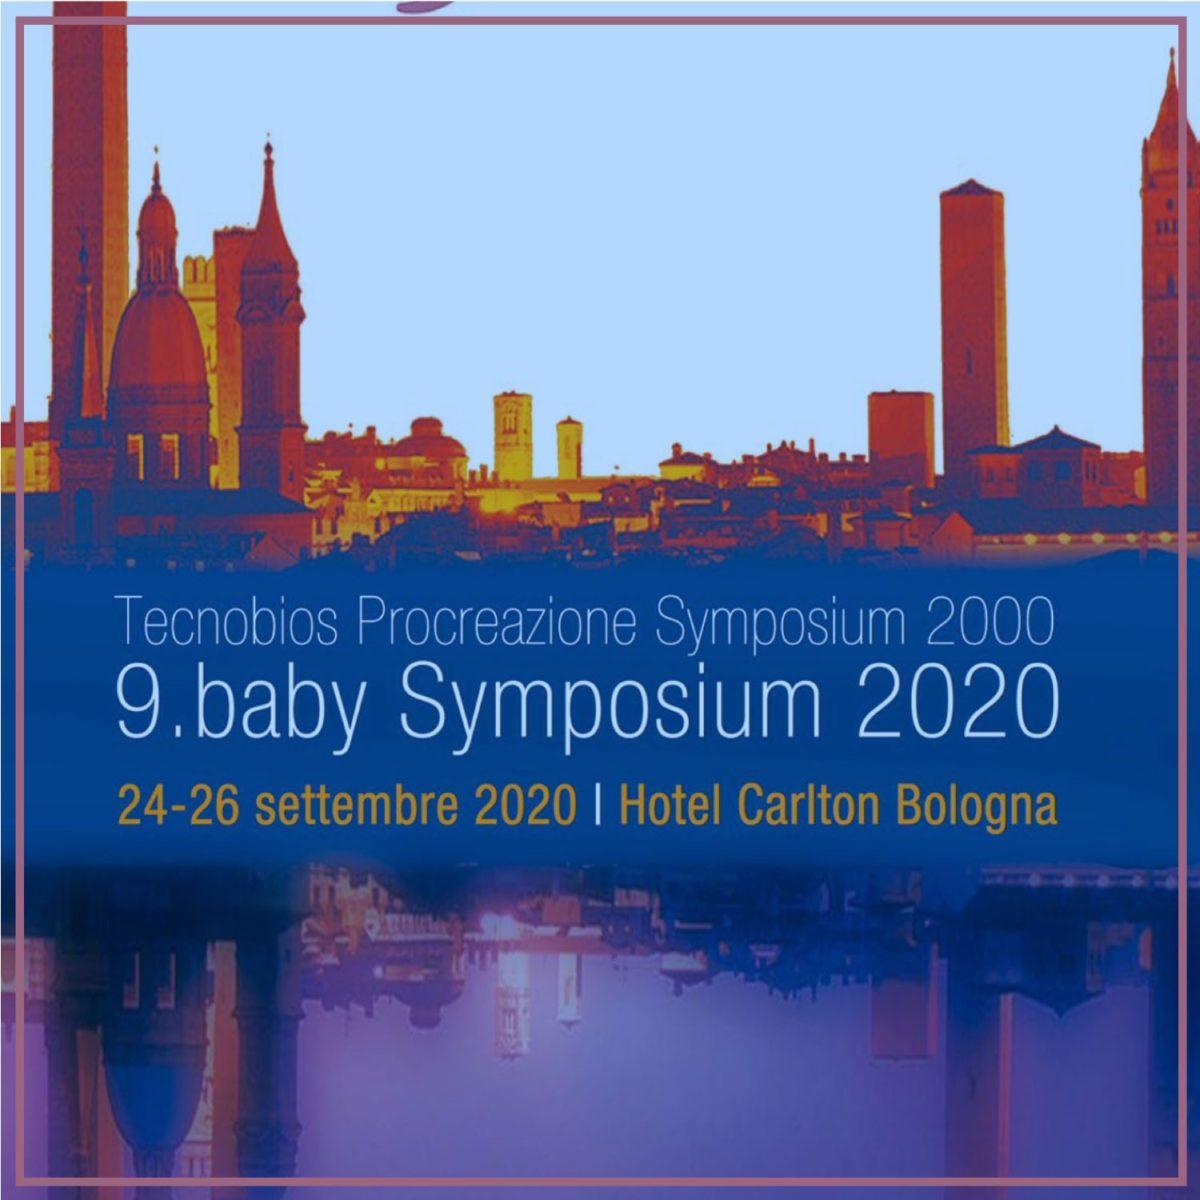 B-Woman-al-9.baby-Symposium-2020-Bologna-24-26-settembre--1200x1200.jpeg